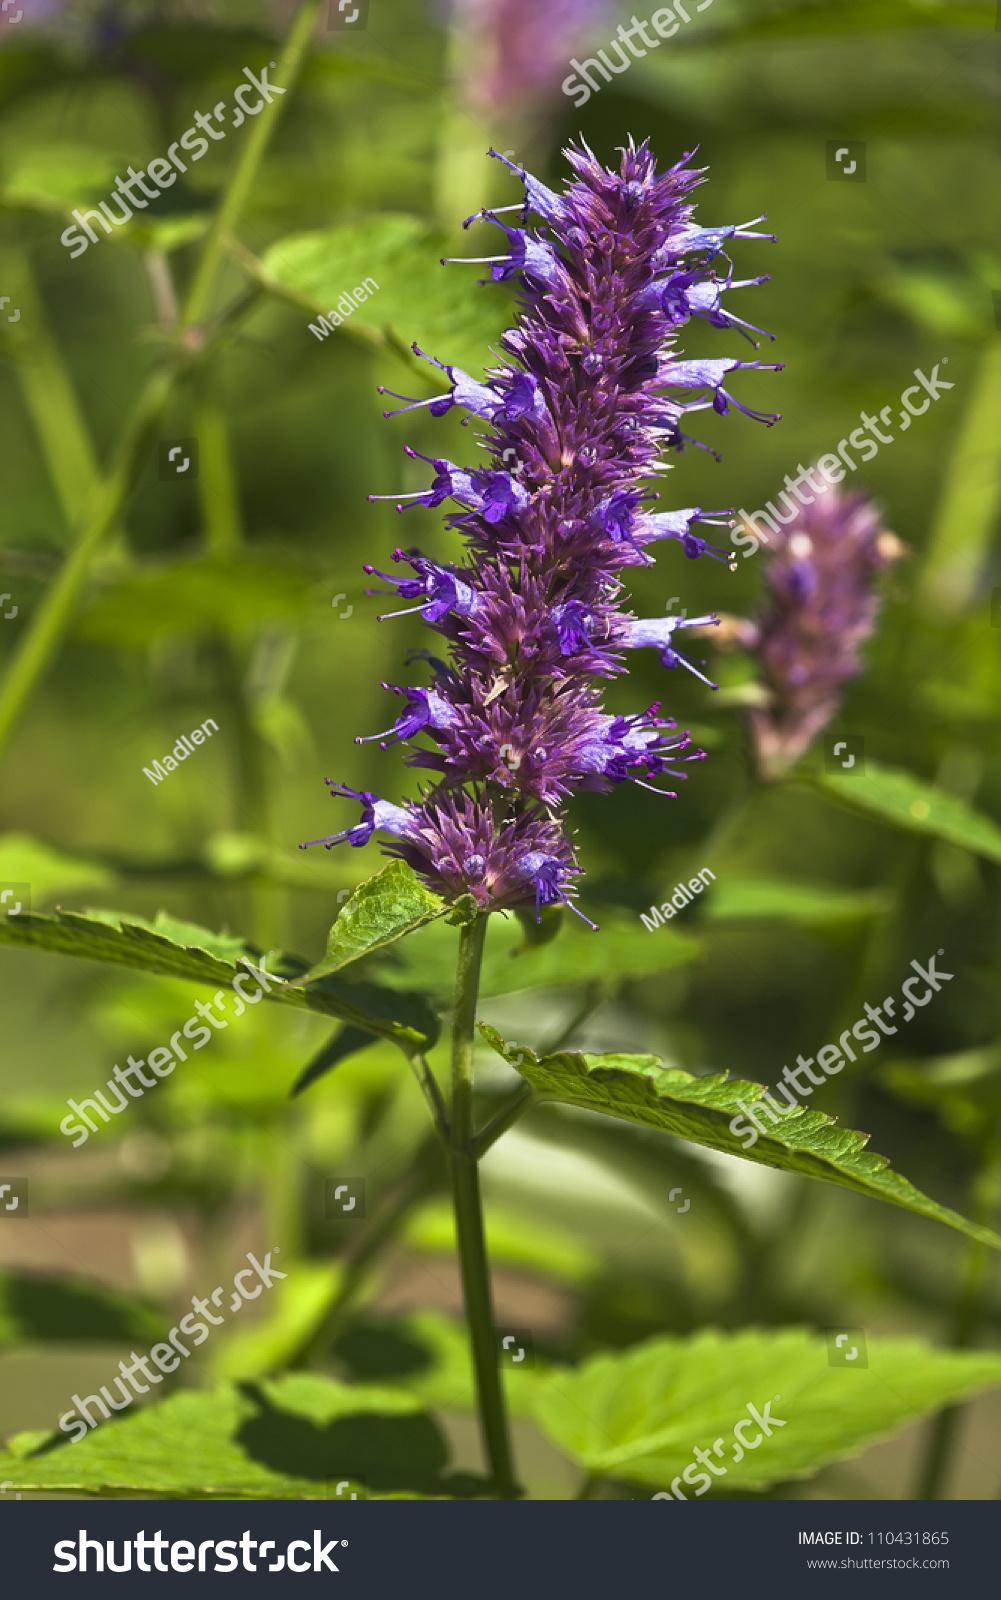 Peppermint Plant Flower Stock Photo 110431865 - Shutterstock